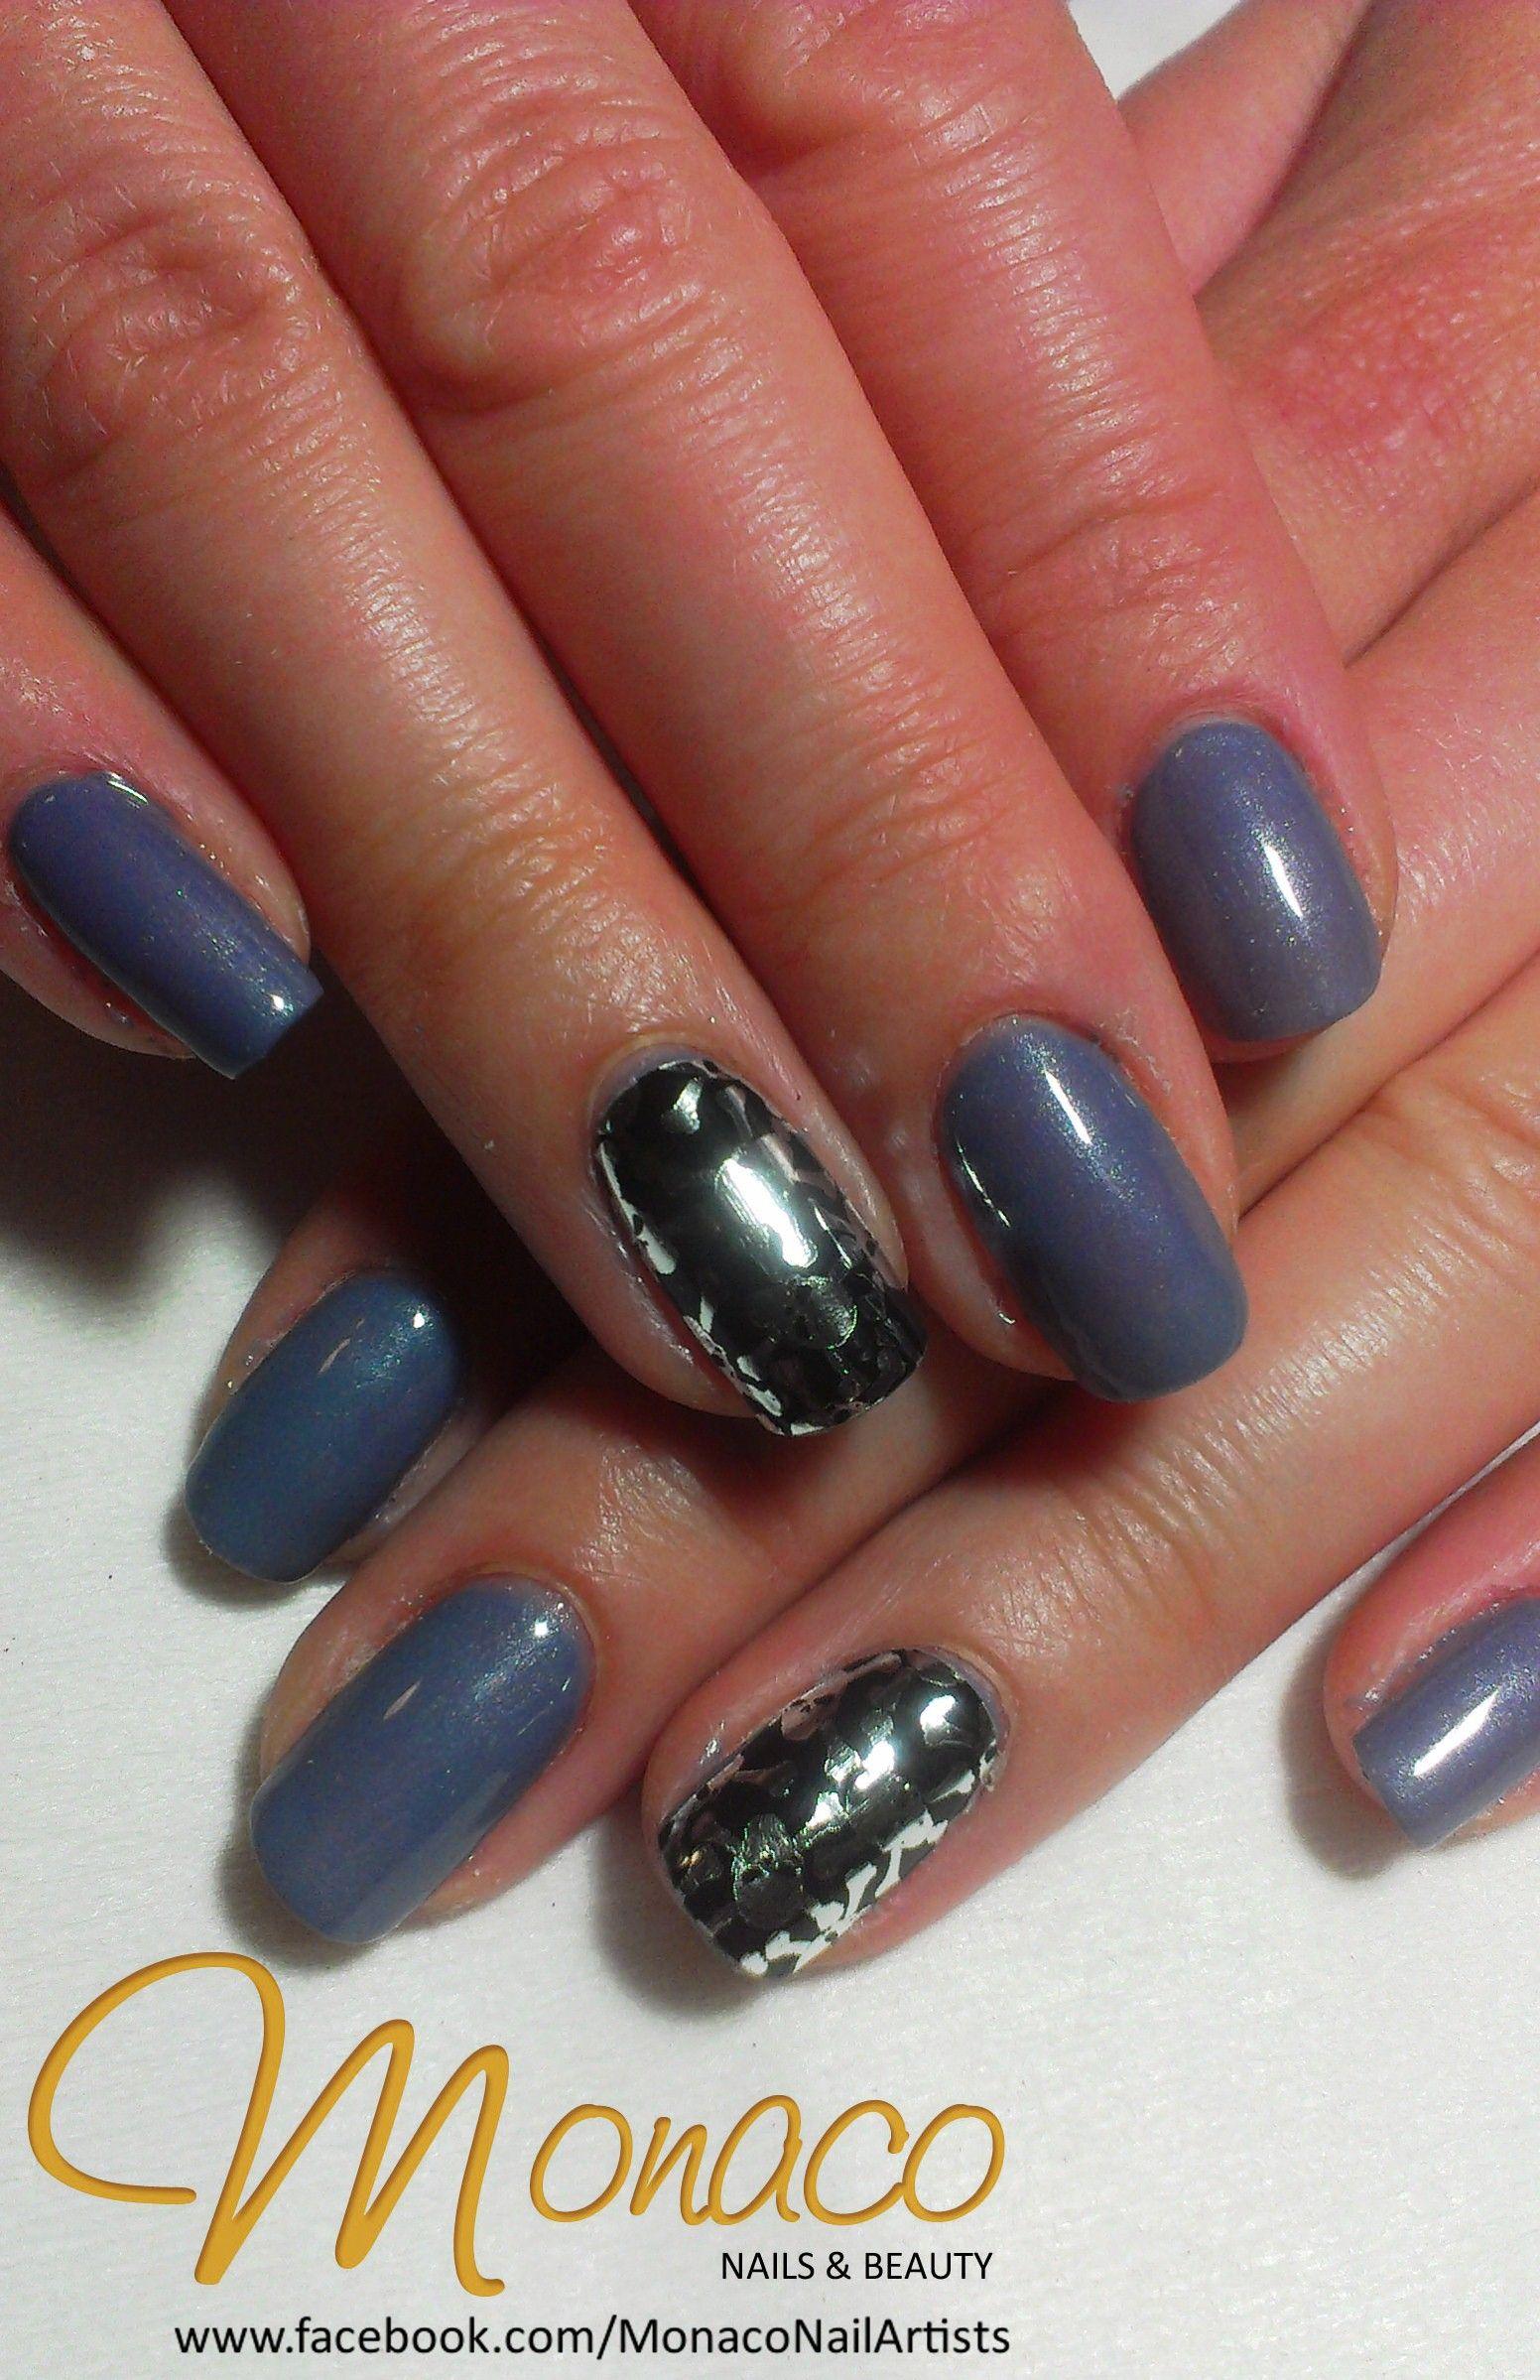 Monaco Nail Academy Nails, Nail art designs, Manicure